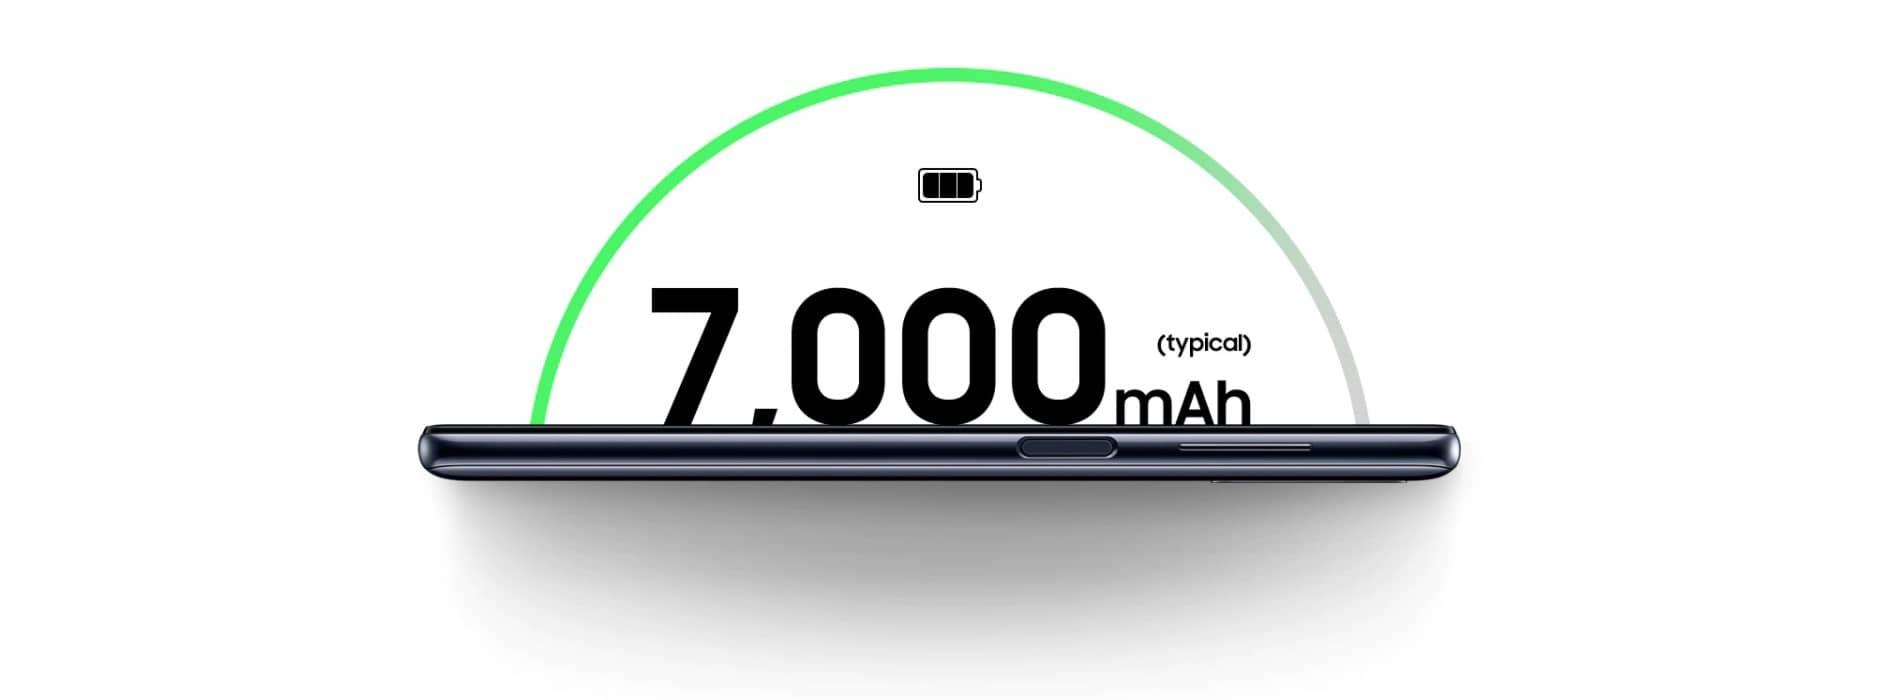 Samsung Galaxy M51 аккумулятор 7000 мАч